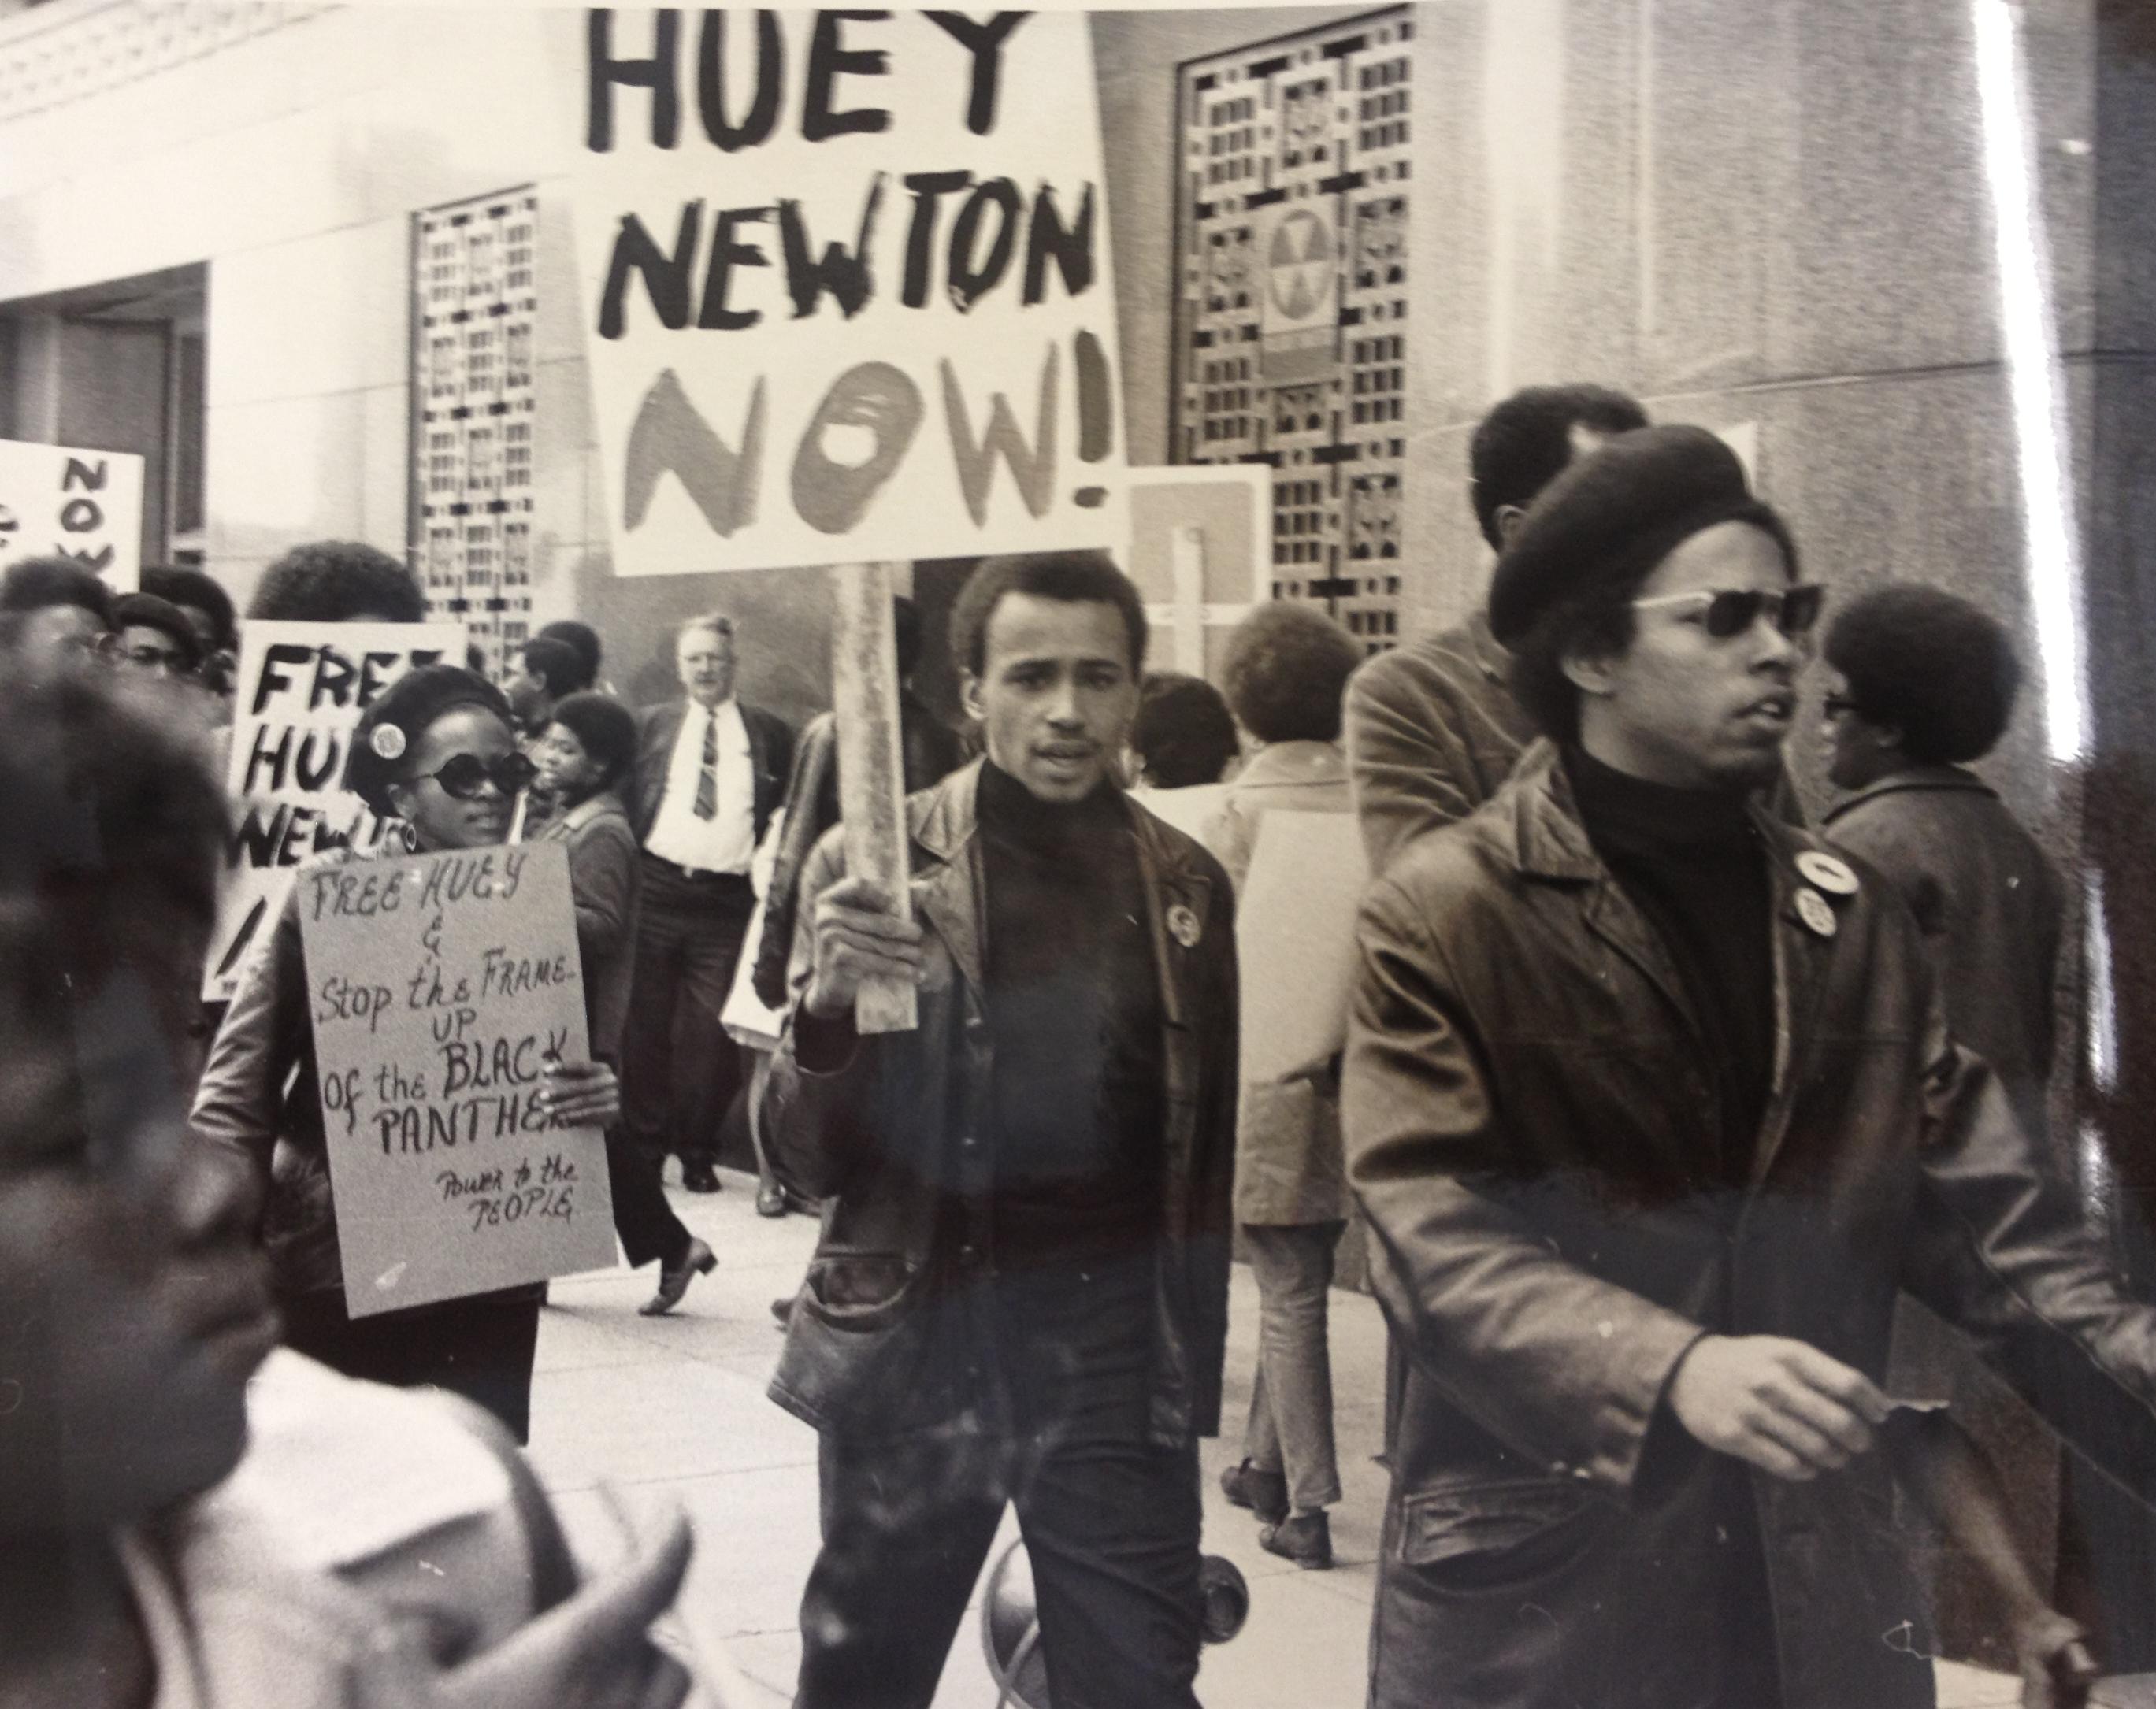 Free Huey Newton Rally Post Office Square, Boston, MA (May 1, 1969)